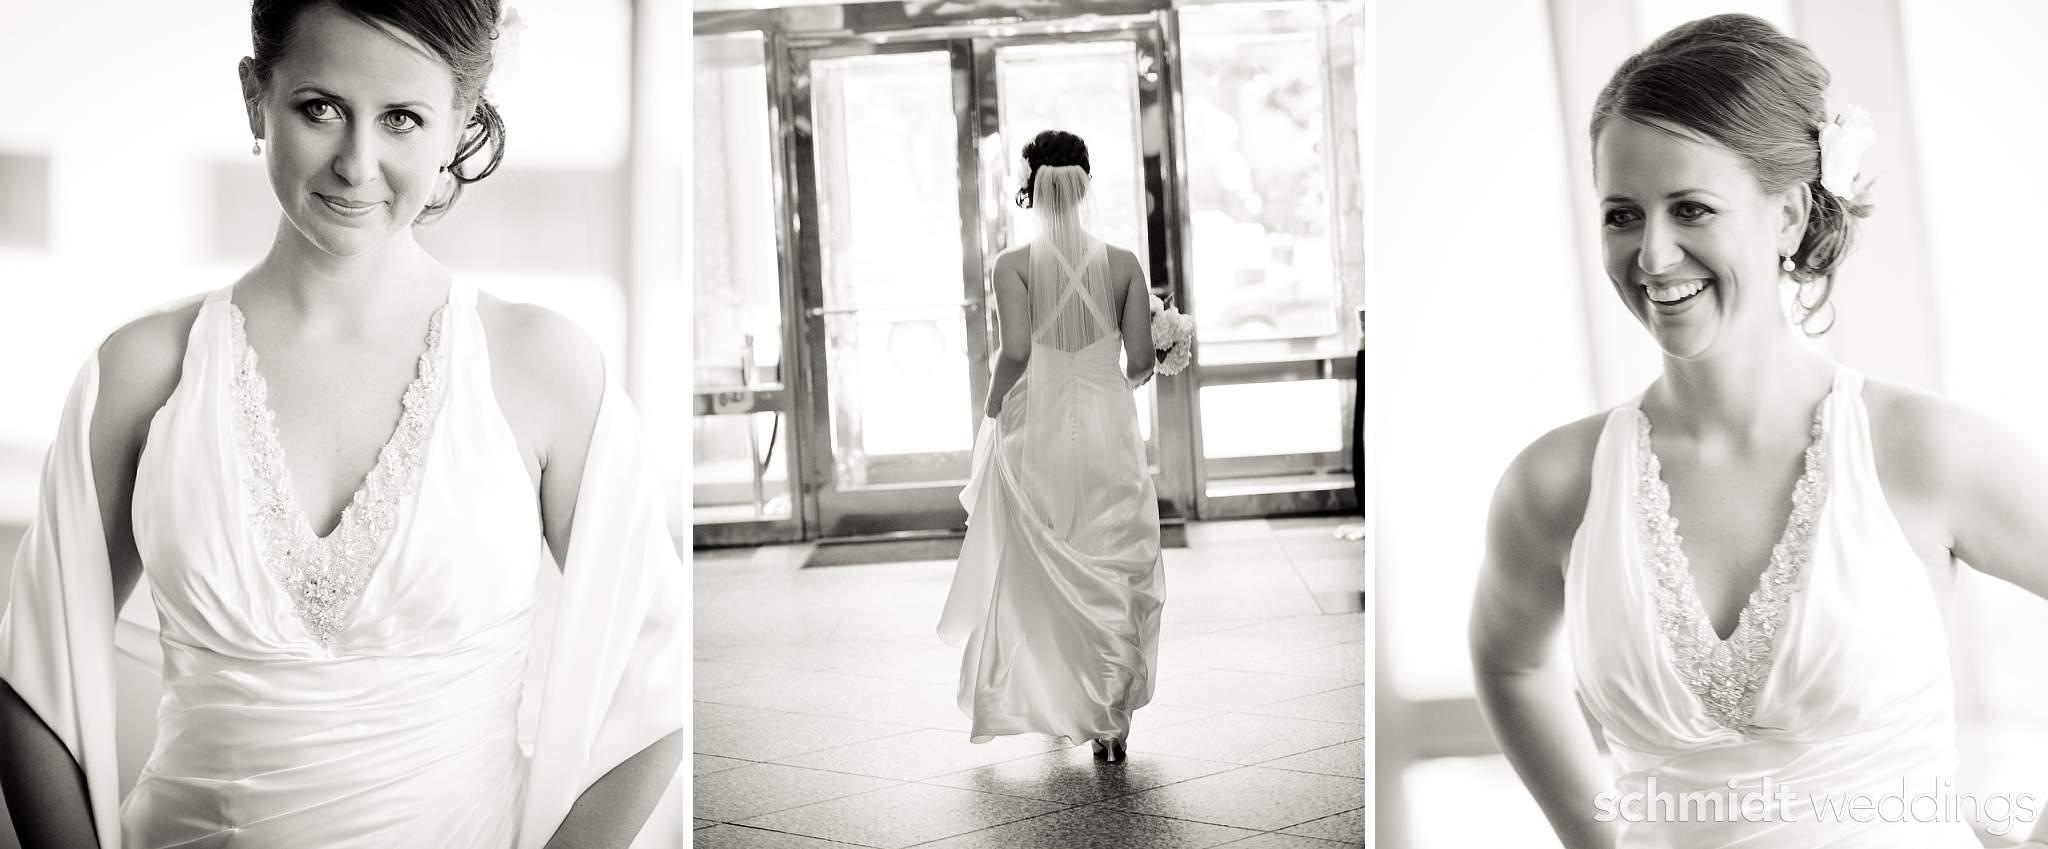 Tom Schmidt Photographer Chicago Wedding